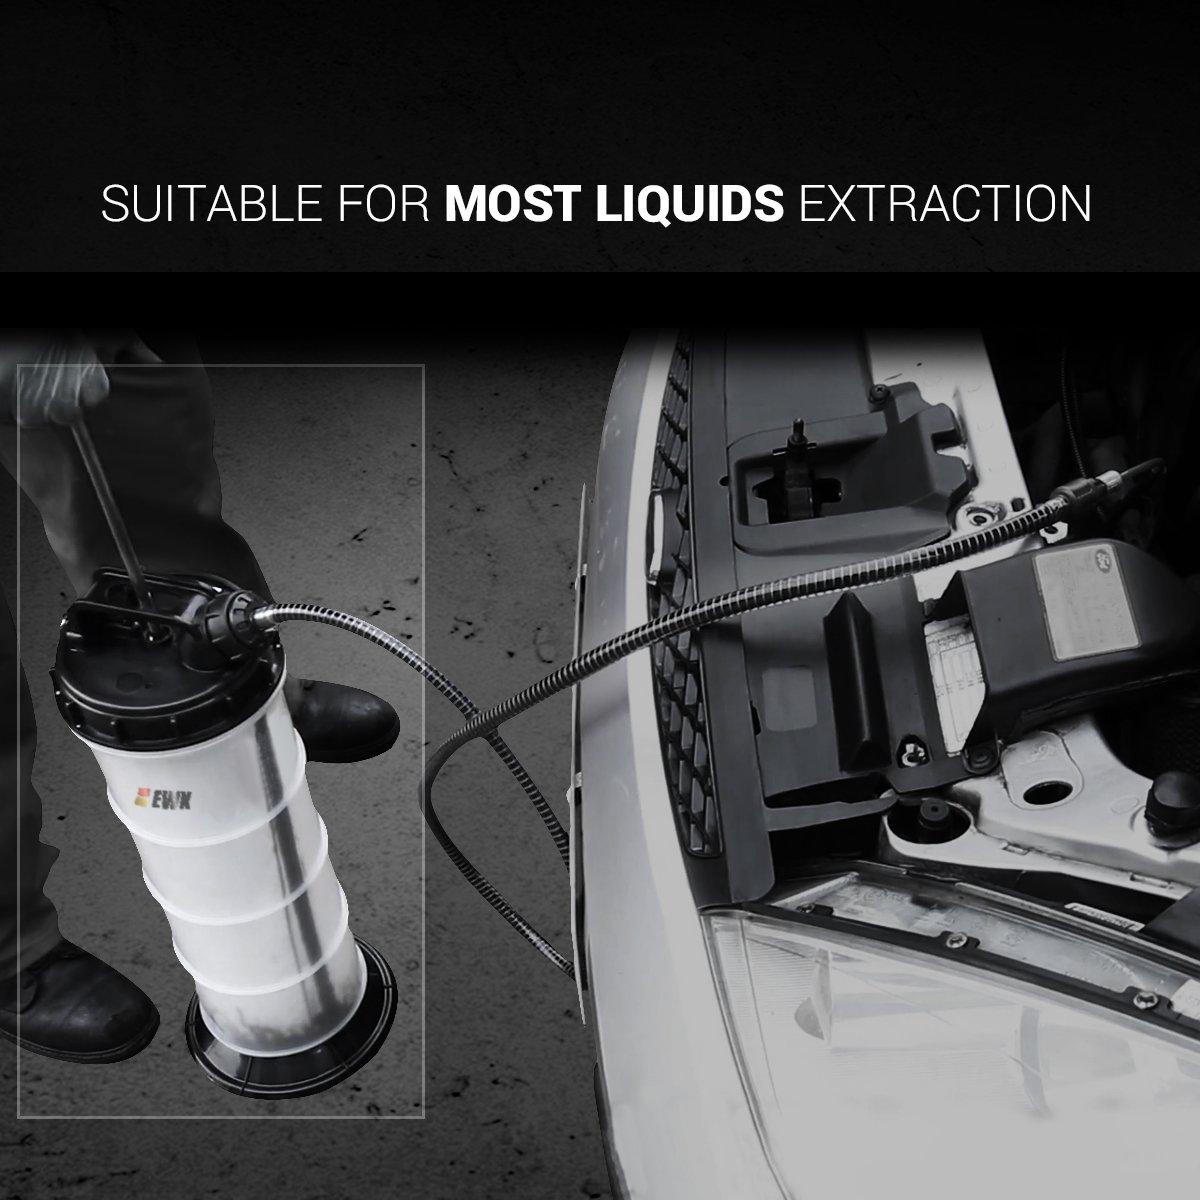 EWK 7.5 Liter Manual Oil Pump Extractor Fluid Evacuator For DIY Oil Change by EWK (Image #3)